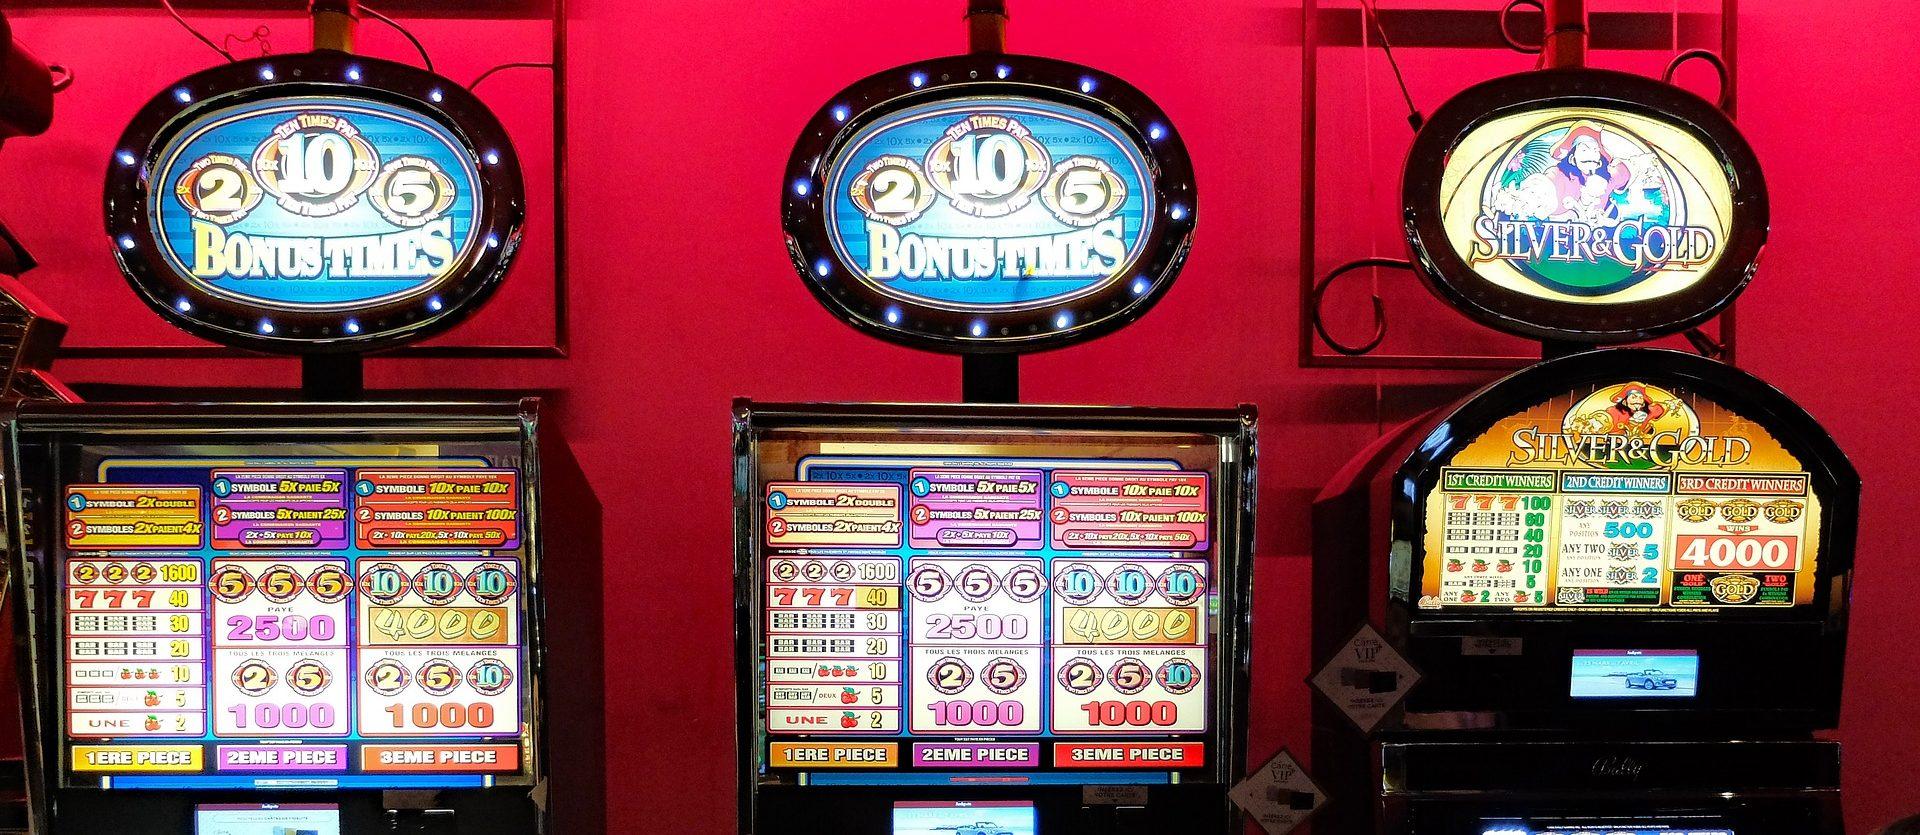 Microgaming Release Two Brand New Progressive Jackpot Video Slots - Online  Casino Geeks